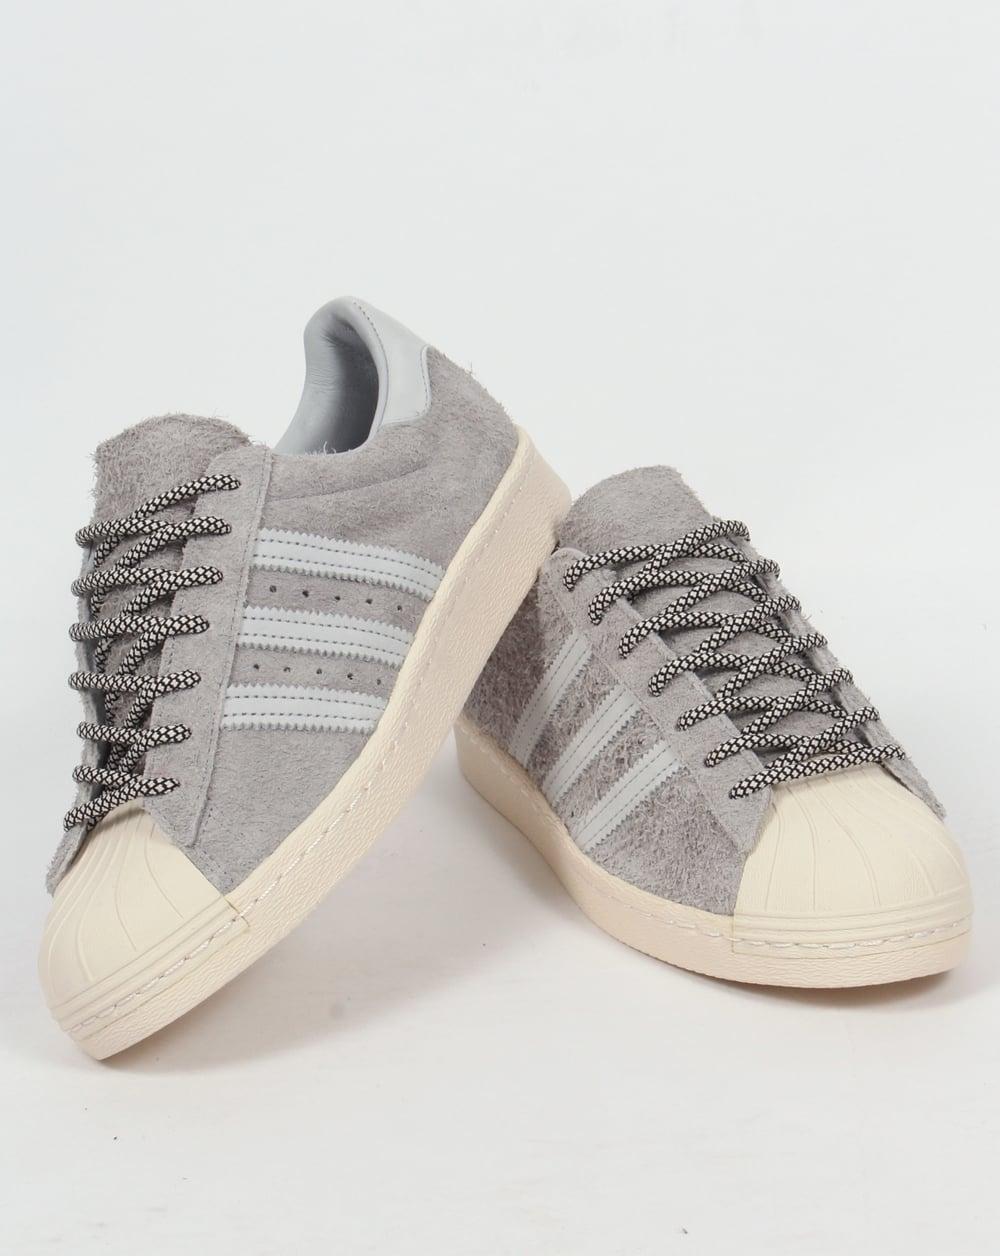 Adidas Originals Superstar Entraîneur De 80 - Gris oGAxYnZ